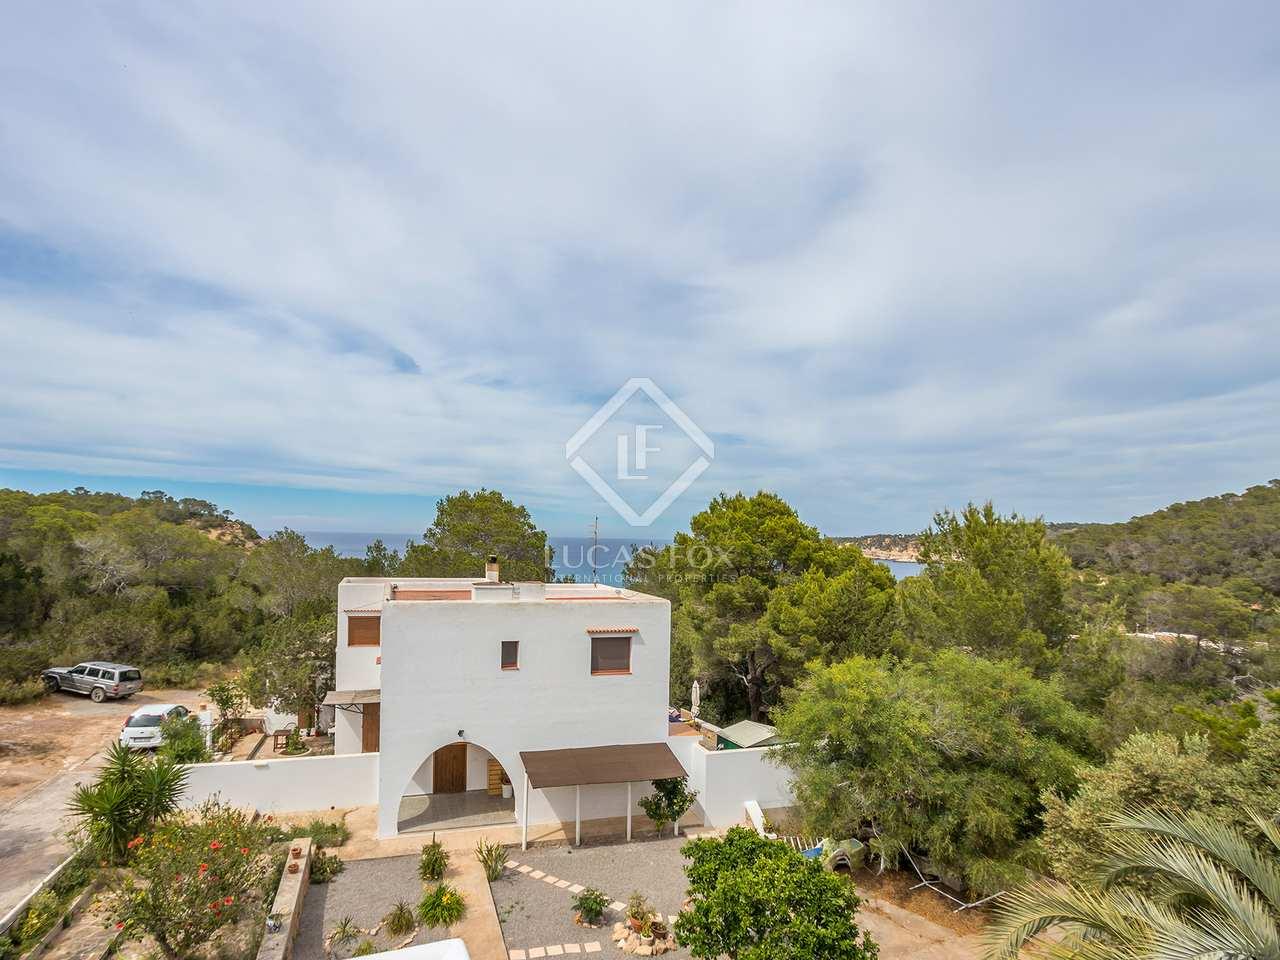 Villa de 99m en venta en cala xarraca san juan for Jardin villa bonita culiacan